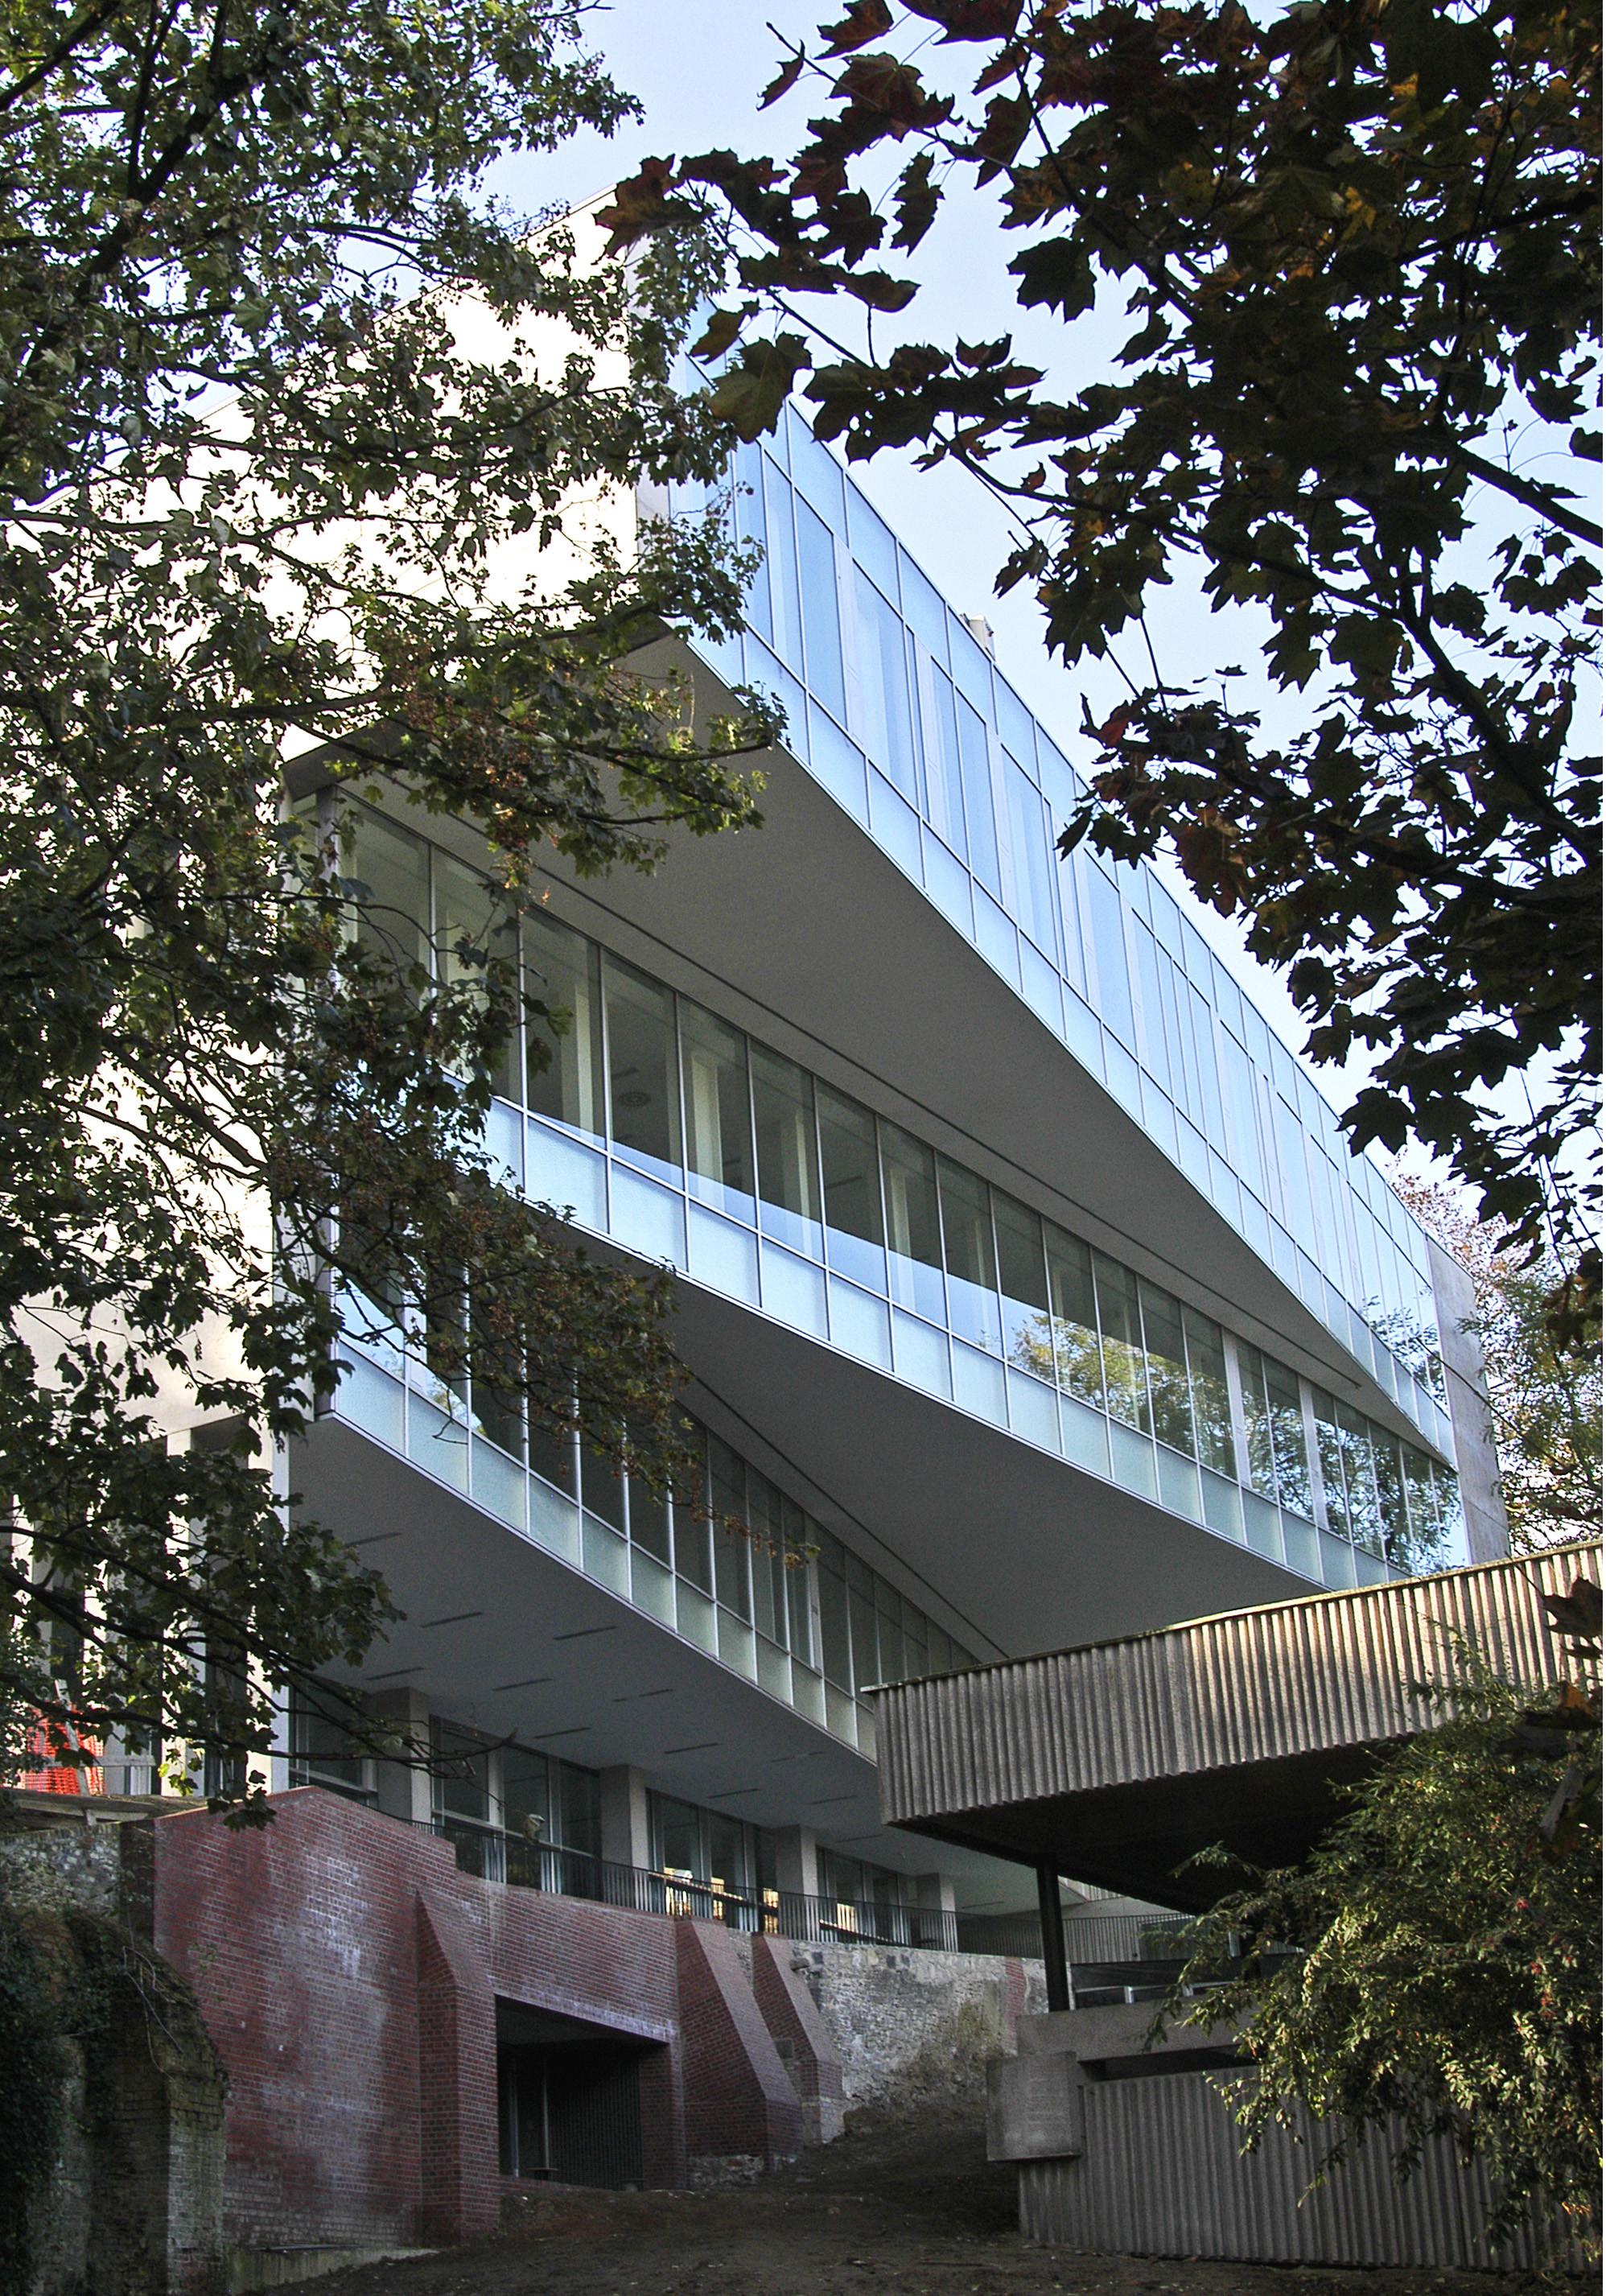 Facultad de Economía Universidad de Ghent / Xaveer De Geyter Architects + Stéphane Beel Architects